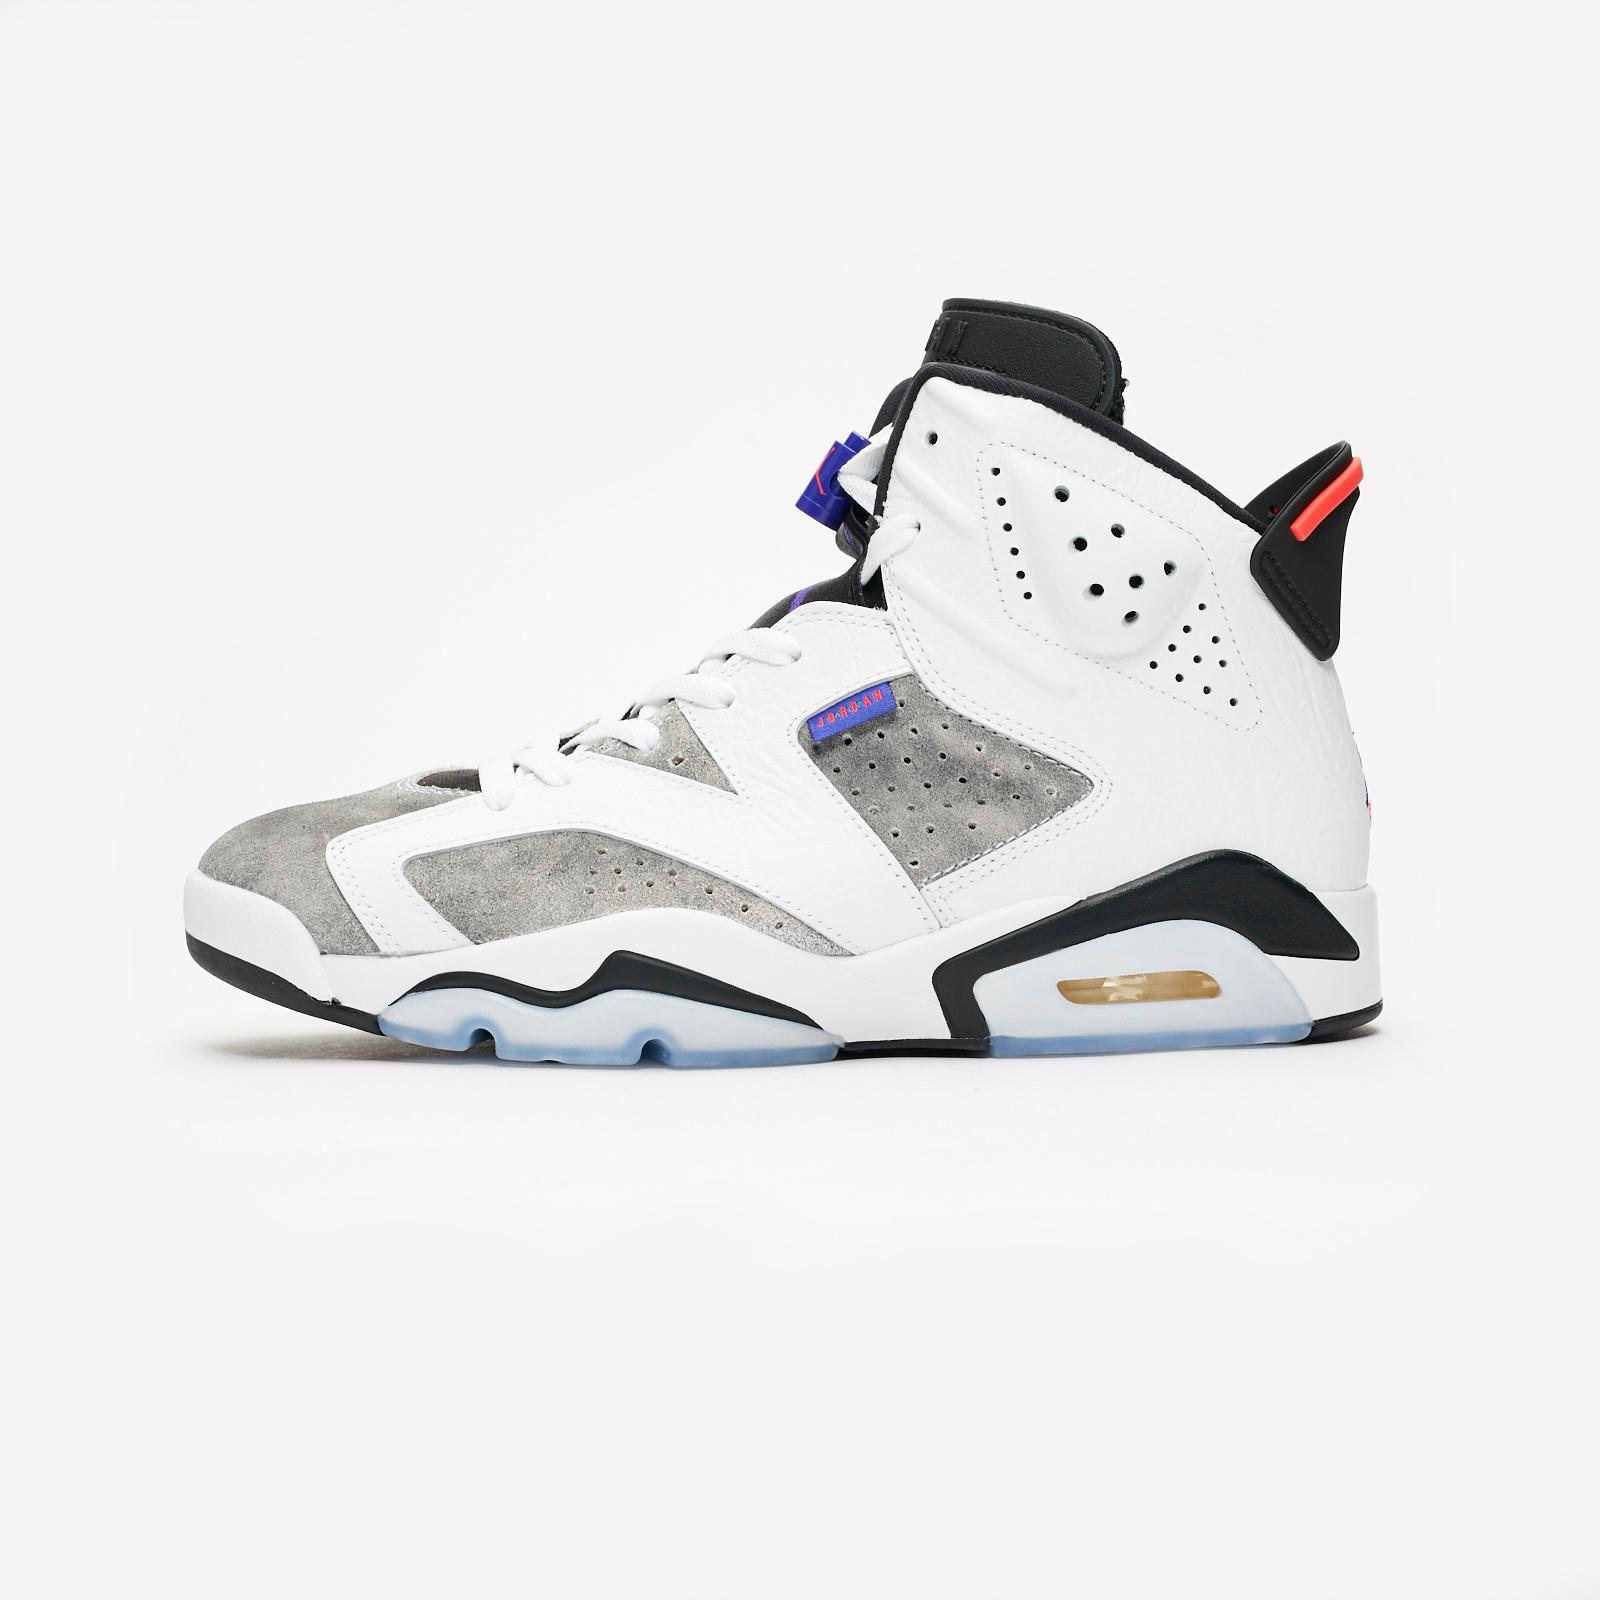 newest 2494c eb210 Jordan Brand Air Jordan 6 Retro LTR - Ci3125-100 - Sneakersnstuff    sneakers   streetwear online since 1999